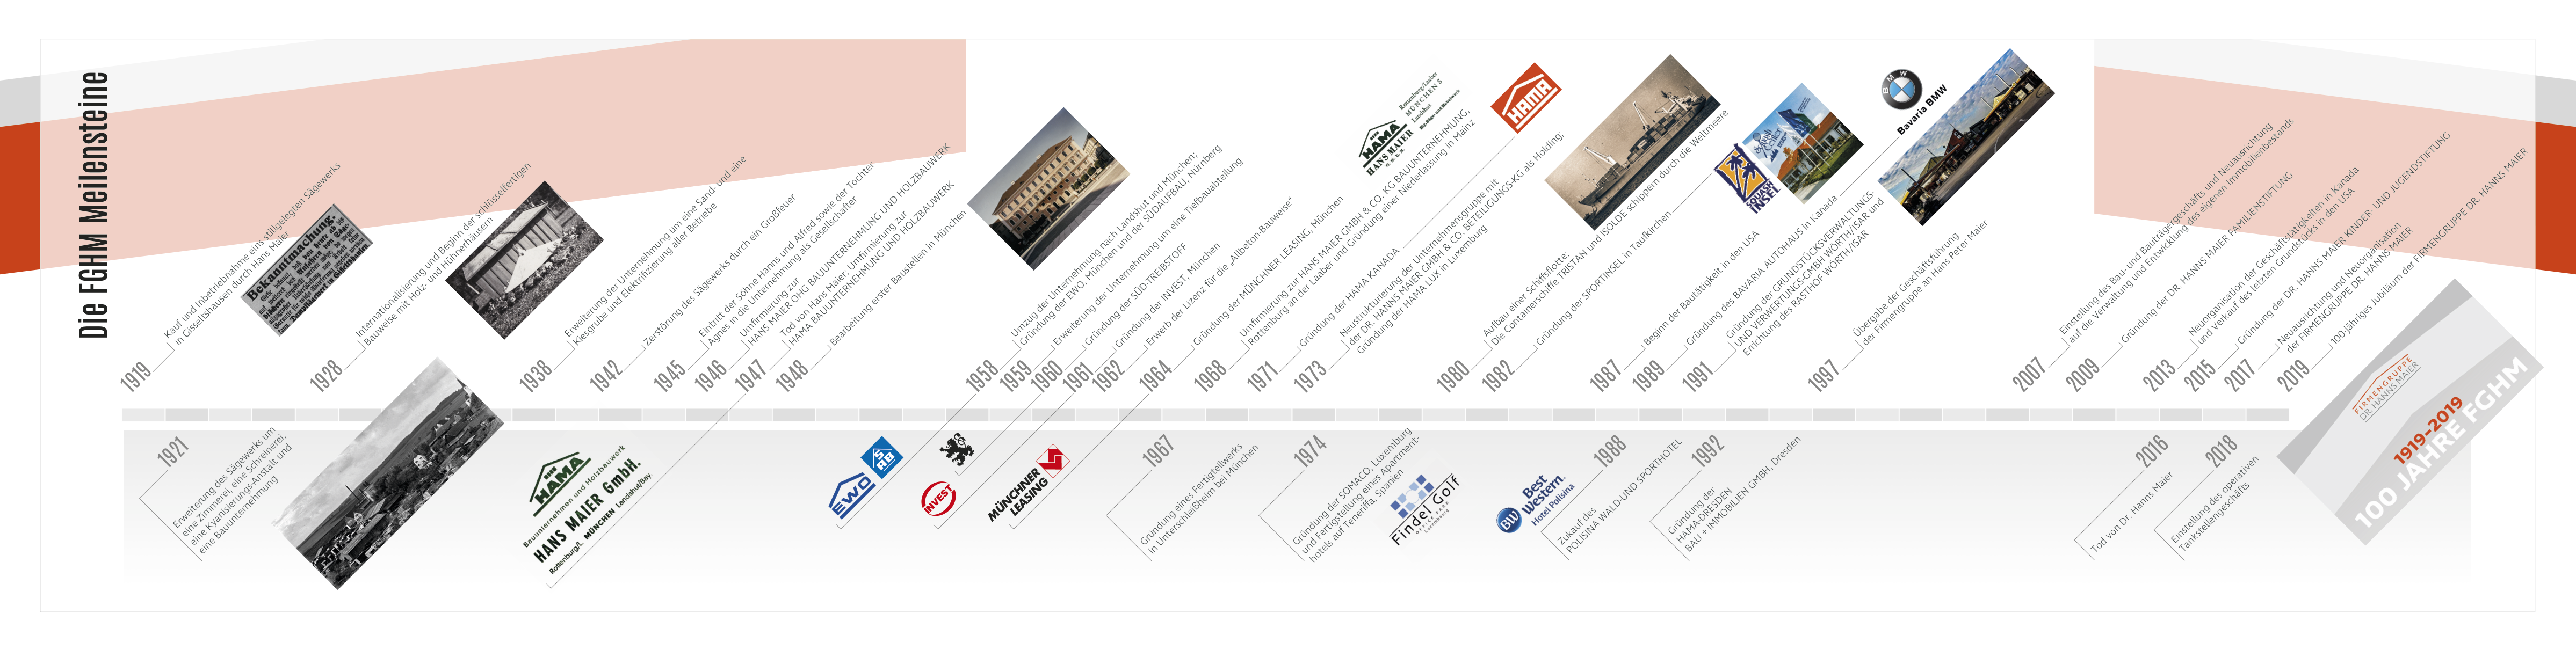 fghm-chronik-100jahre_timeline